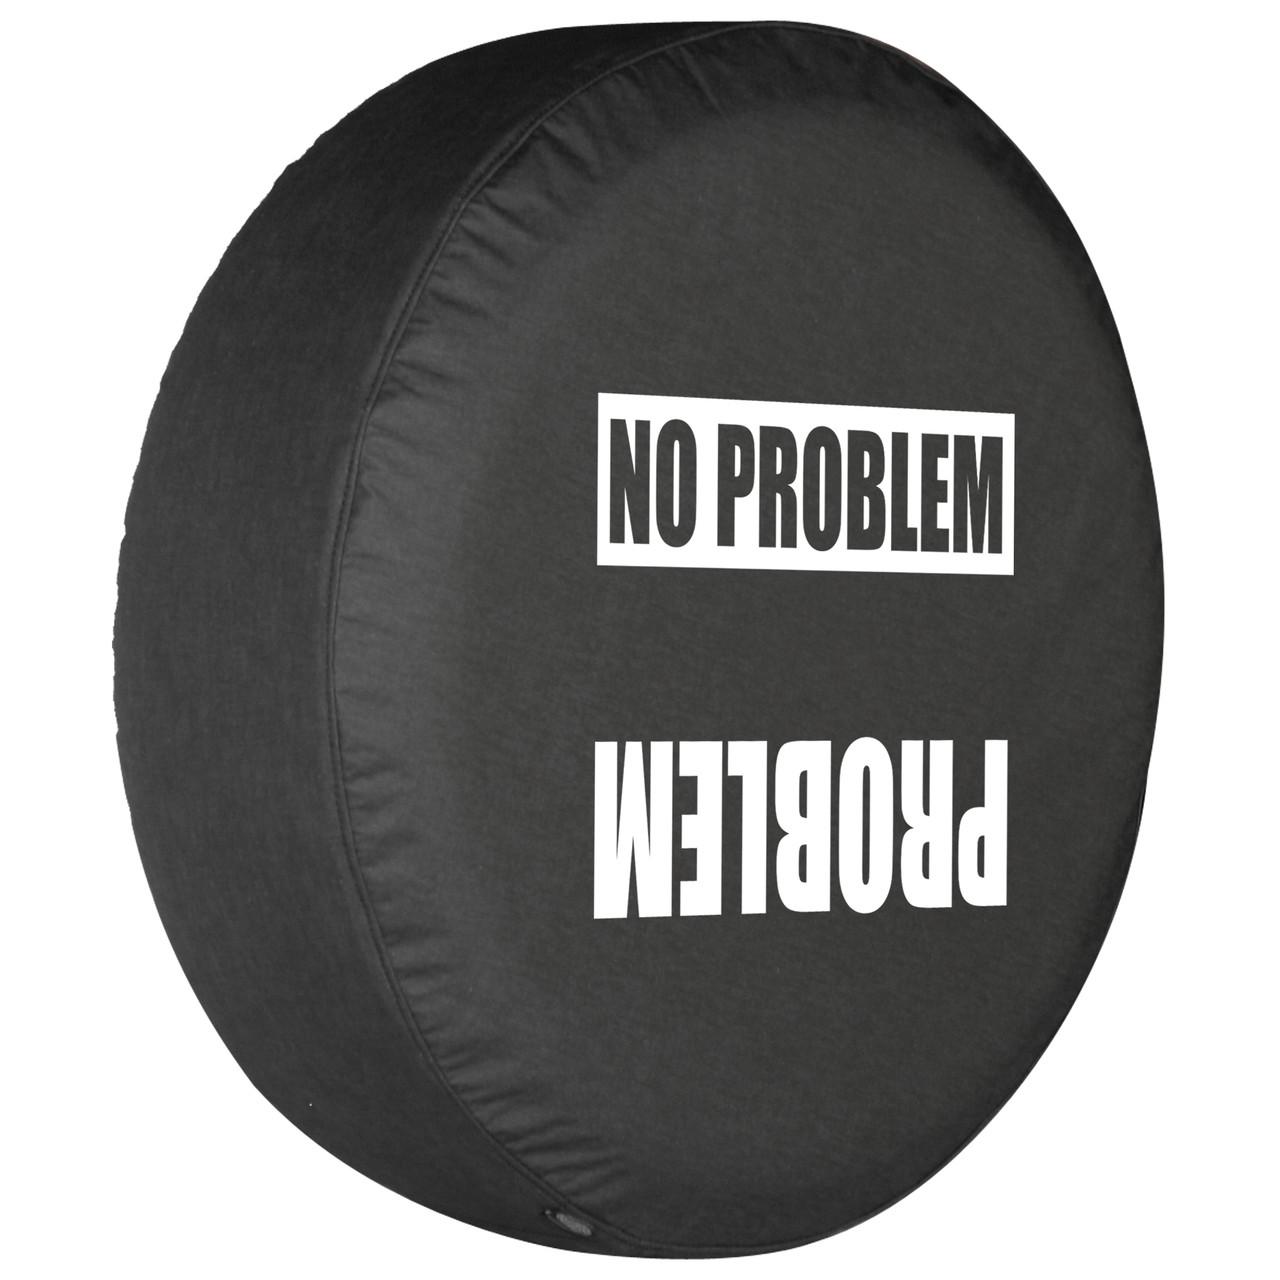 medium resolution of problem no problem soft denim vinyl tire cover by boomerang